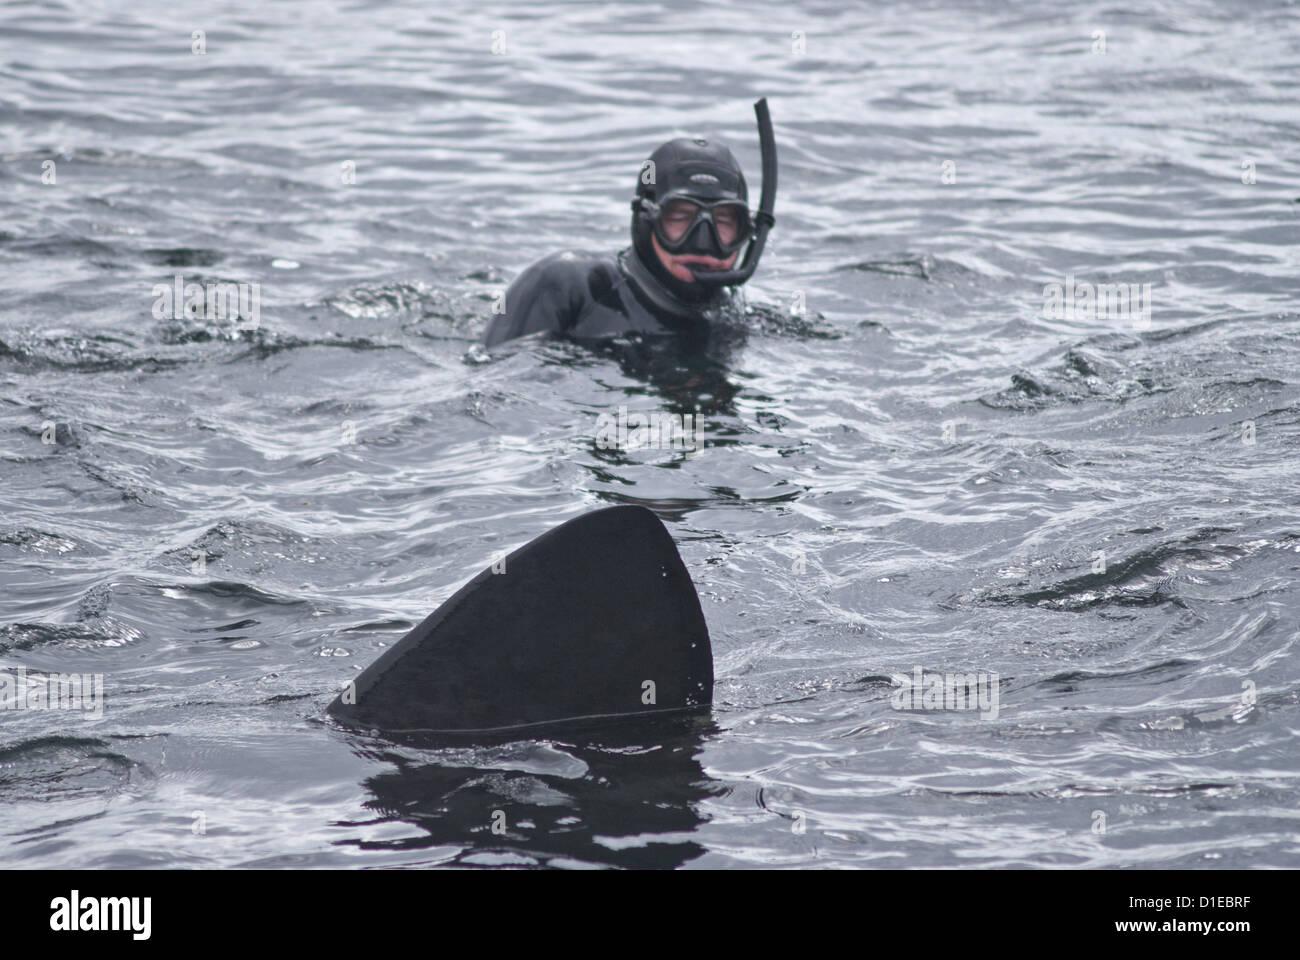 Diver approached by basking shark (Cetorhinus maximus), Hebrides, Scotland, United Kingdom, Europe - Stock Image